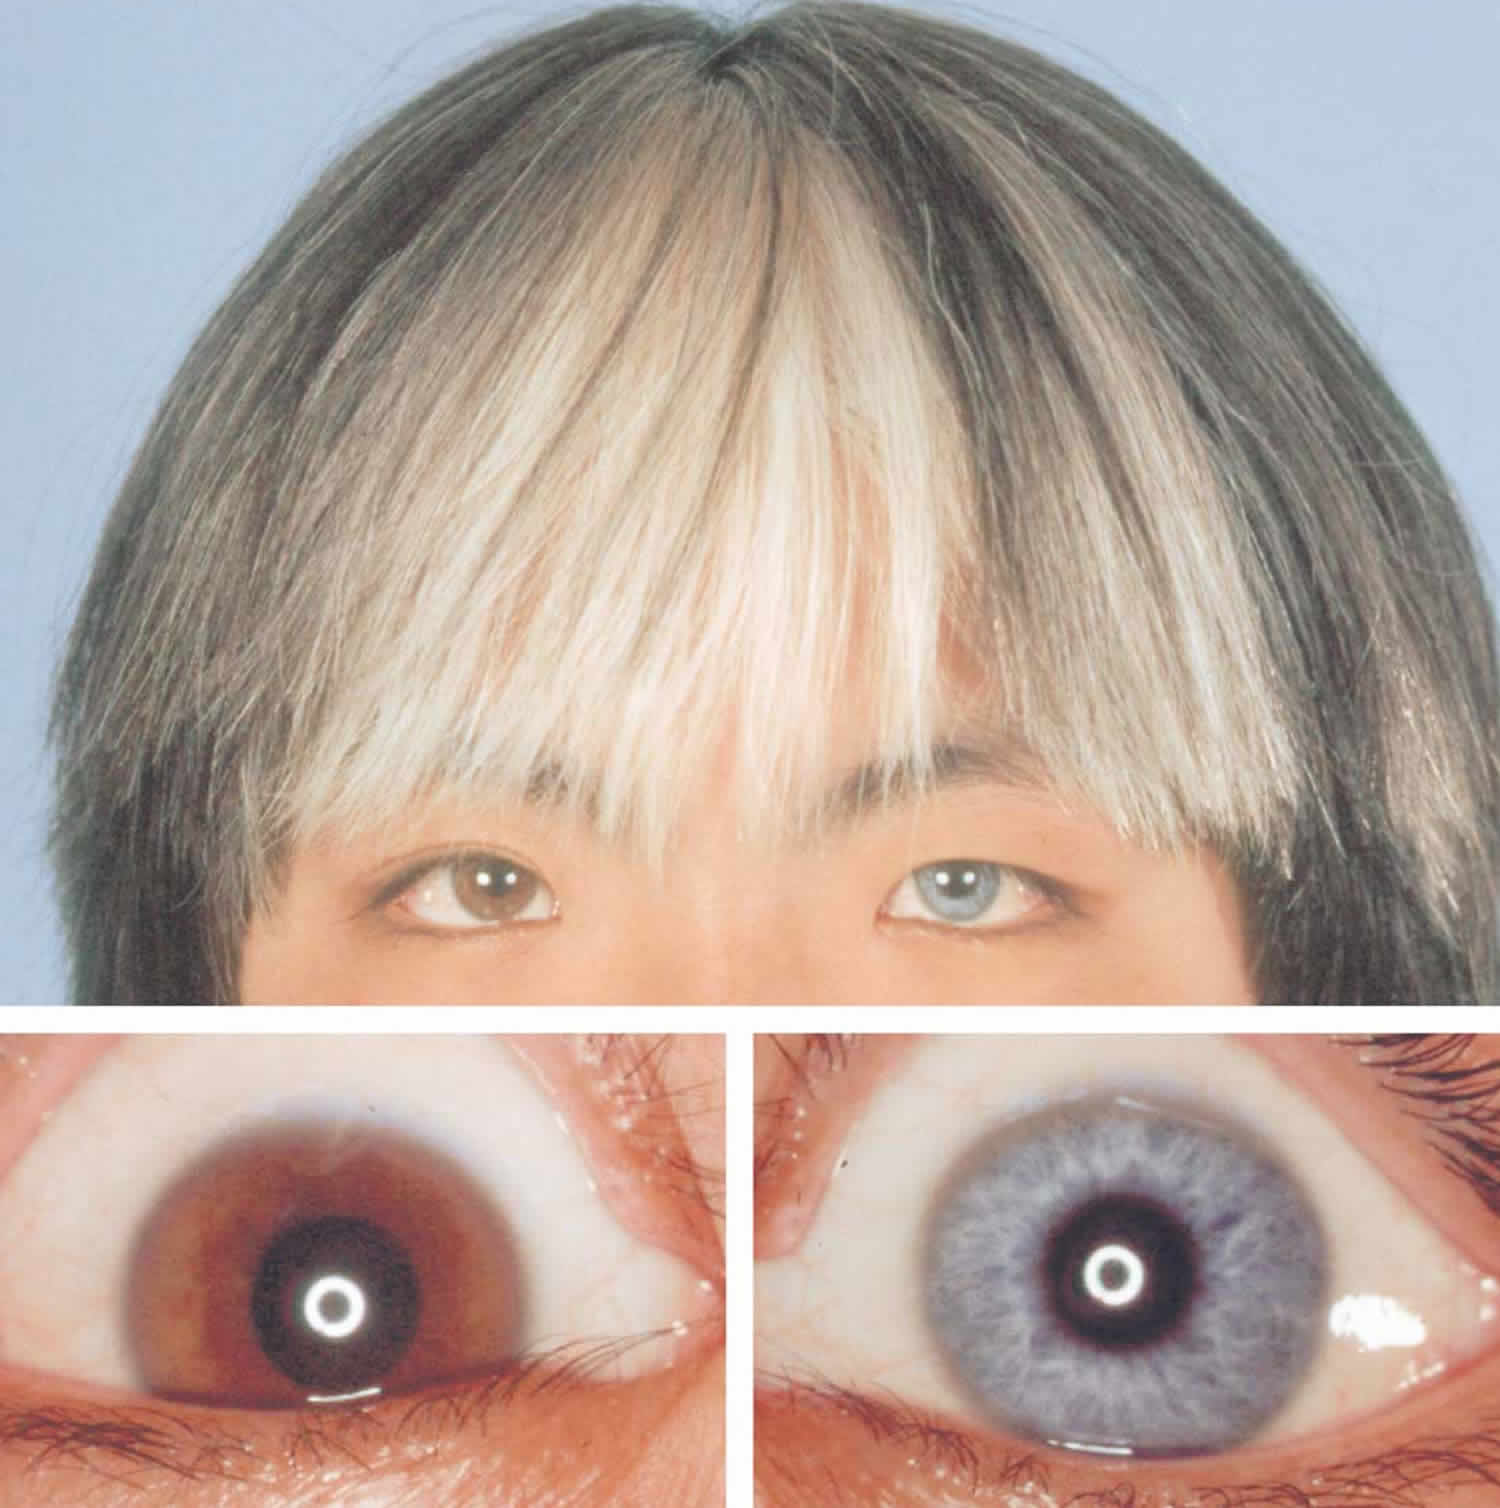 Waardenburg syndrome eyes